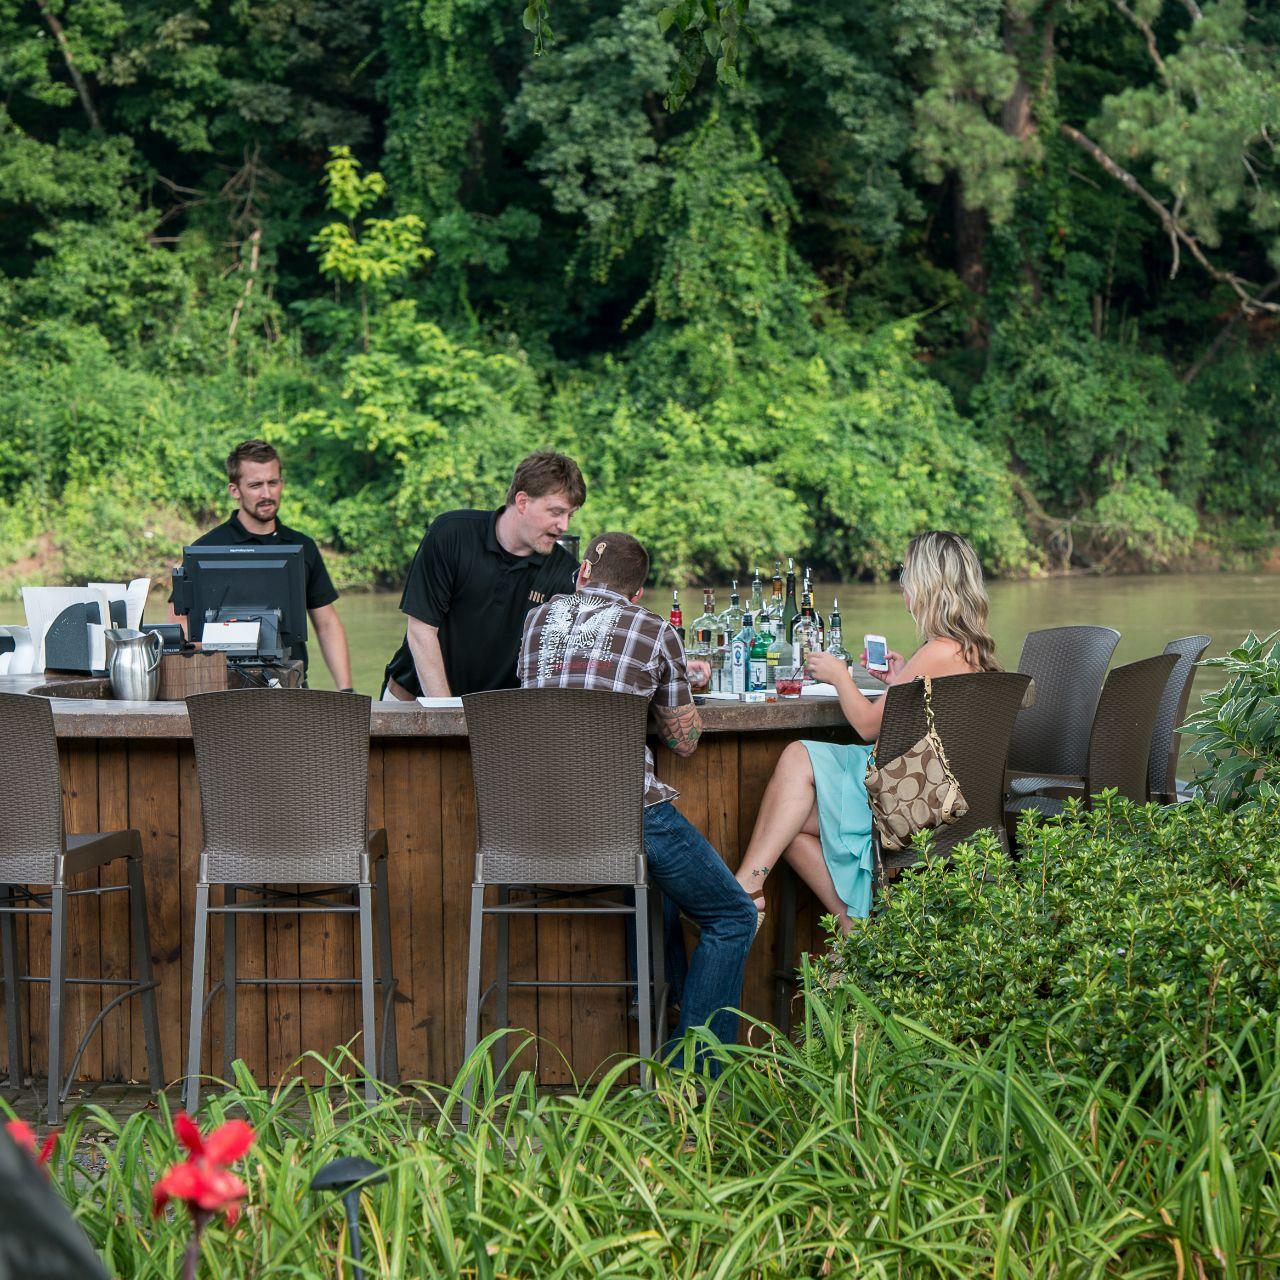 Wondrous Canoe Restaurant Atlanta Ga Opentable Download Free Architecture Designs Scobabritishbridgeorg